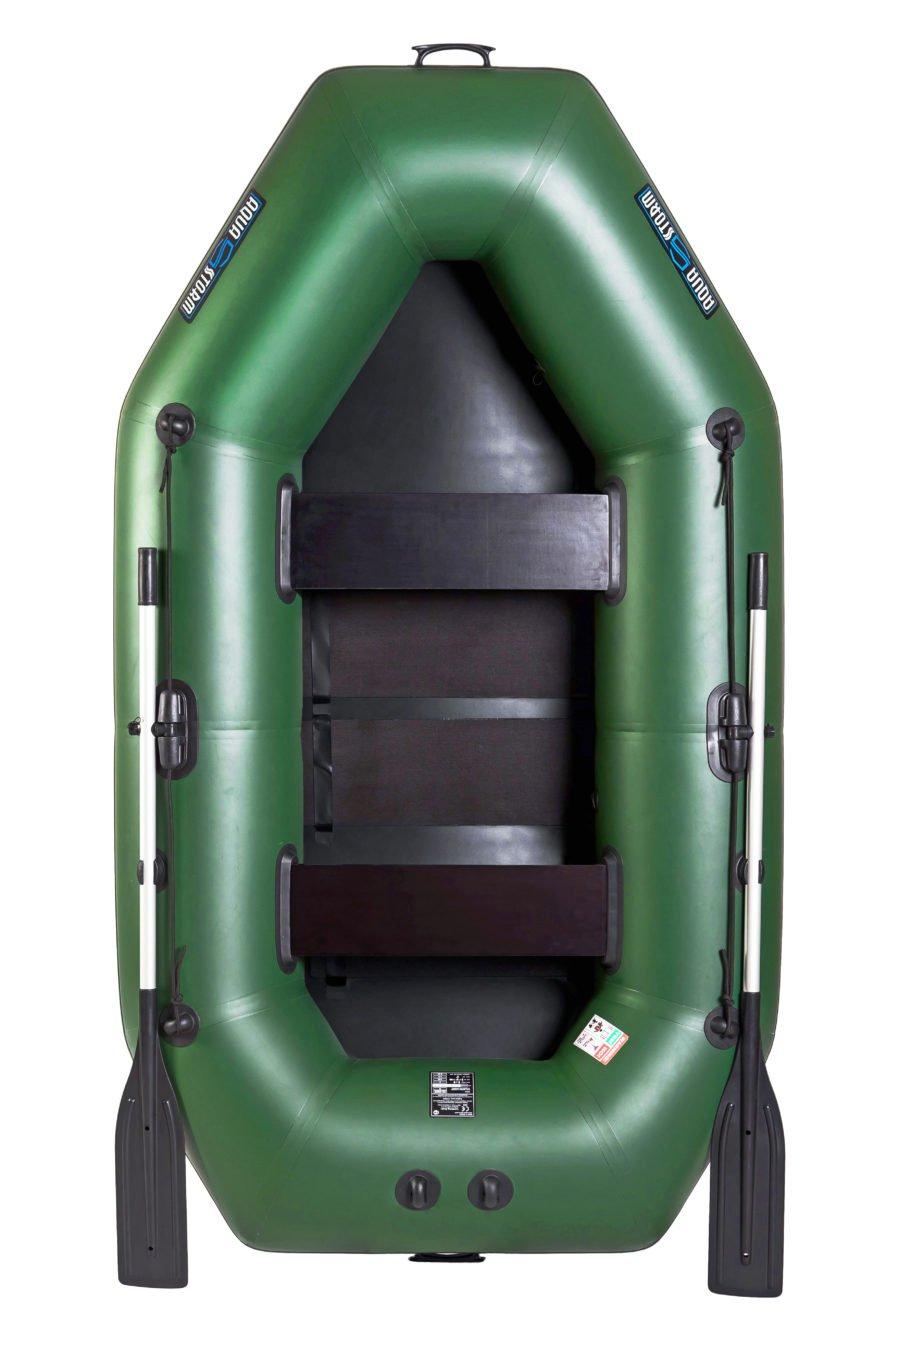 Надувная лодка Aqua-Storm SS260RCK слань-книжка